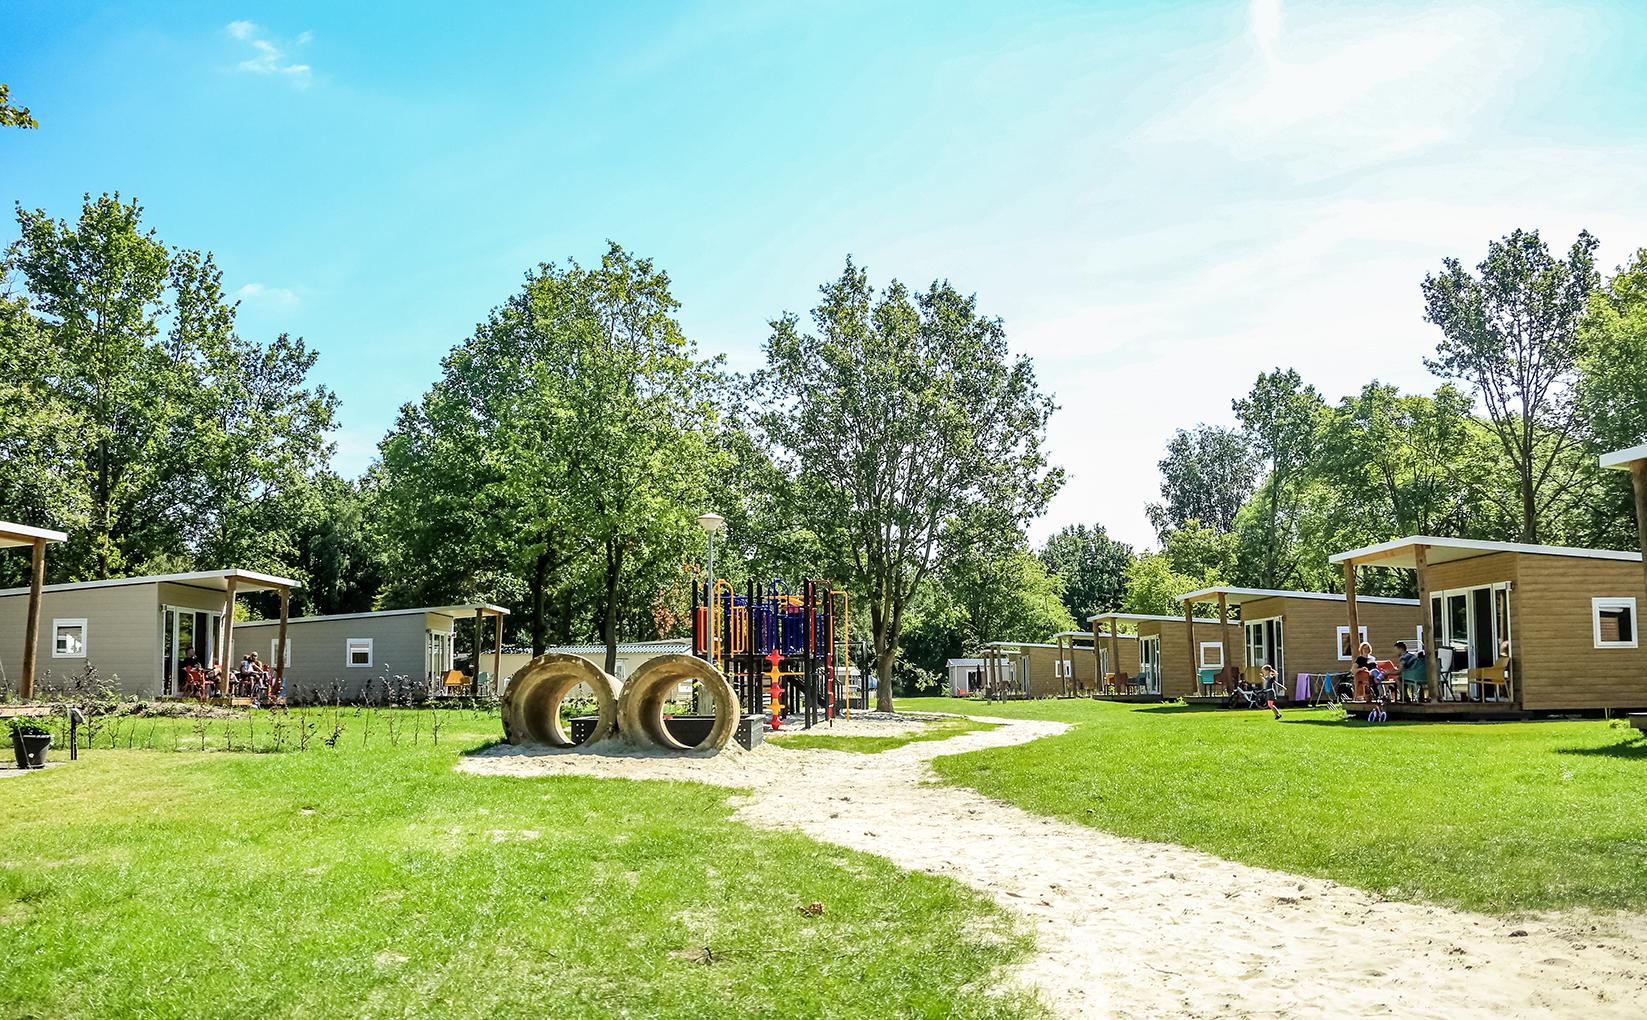 Camping Wedderbergen